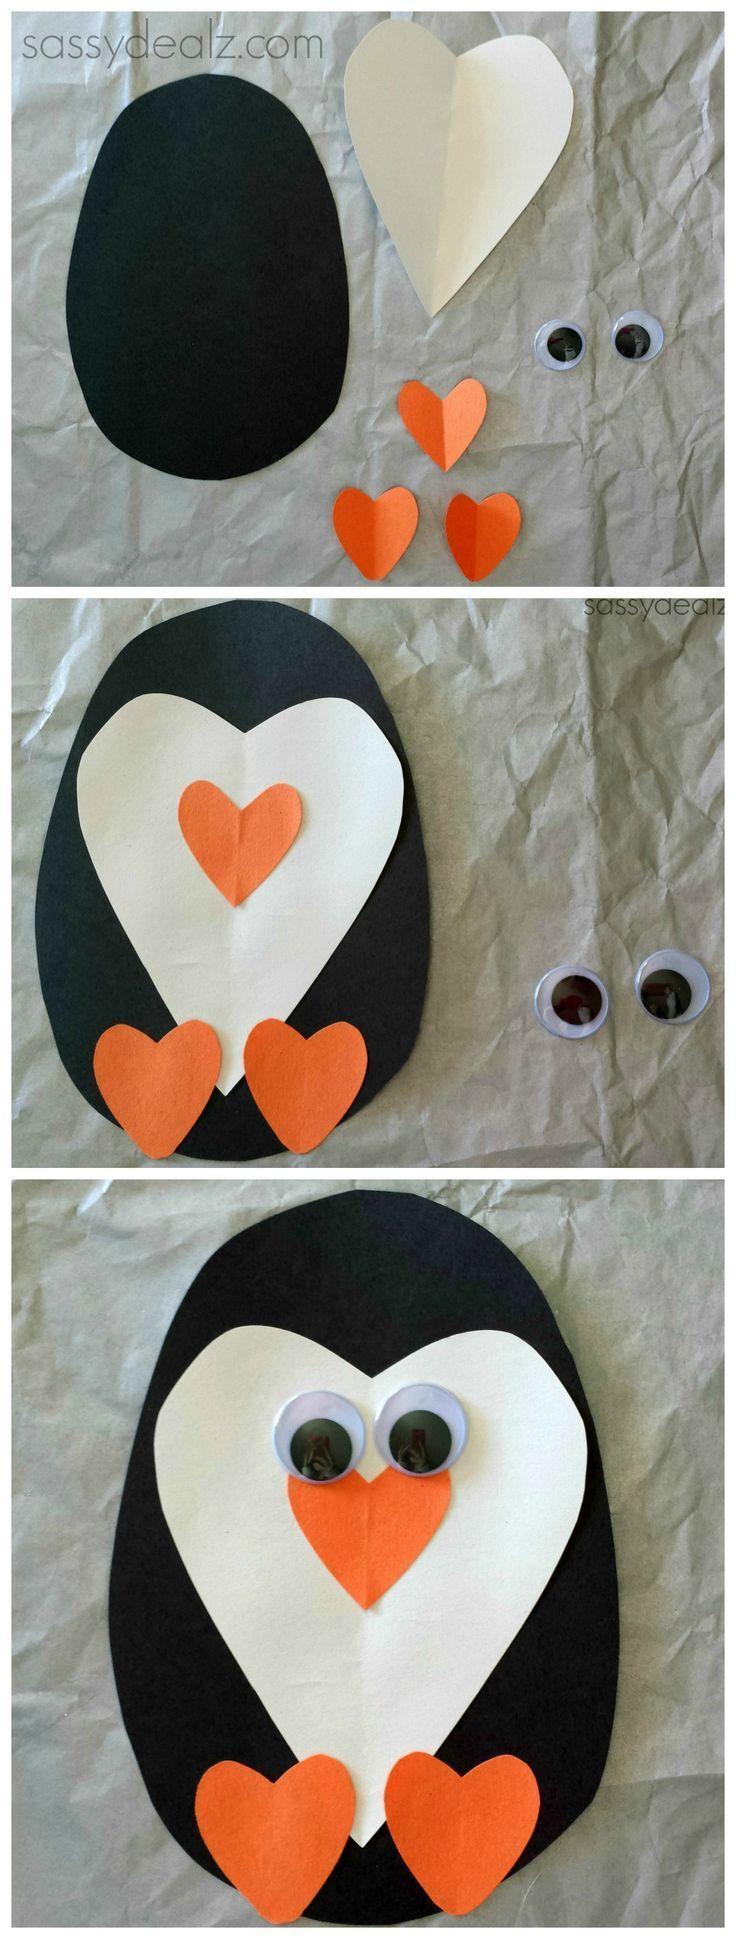 Paper Heart Penguin Craft For Kids #Valentines craft #DIY heart animal art project #winter craft | CraftyMorning.com